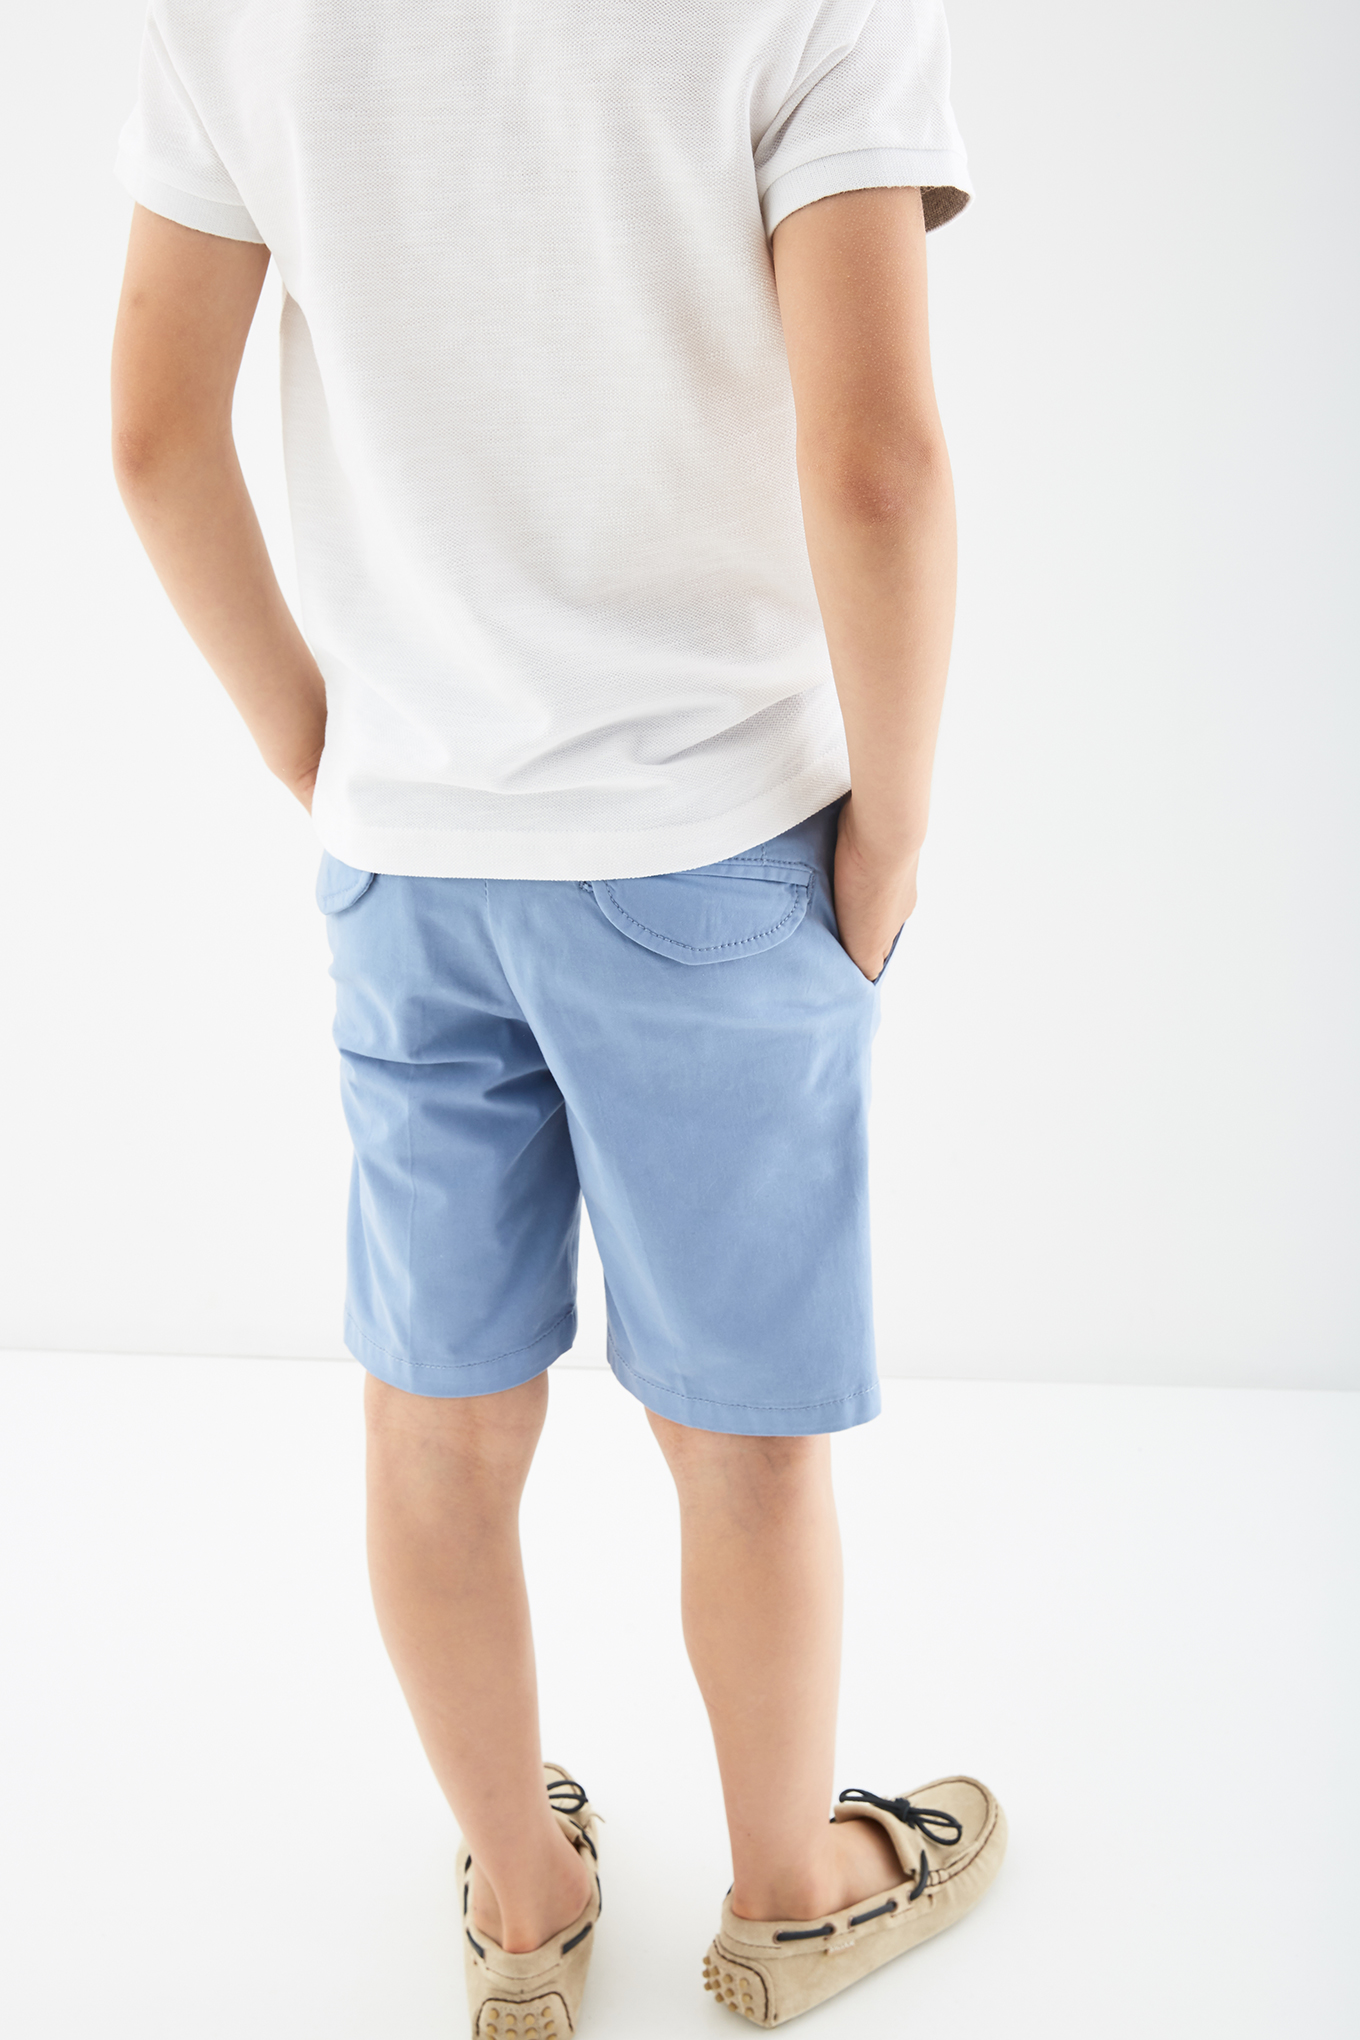 Bermuda Light Blue Casual Boy